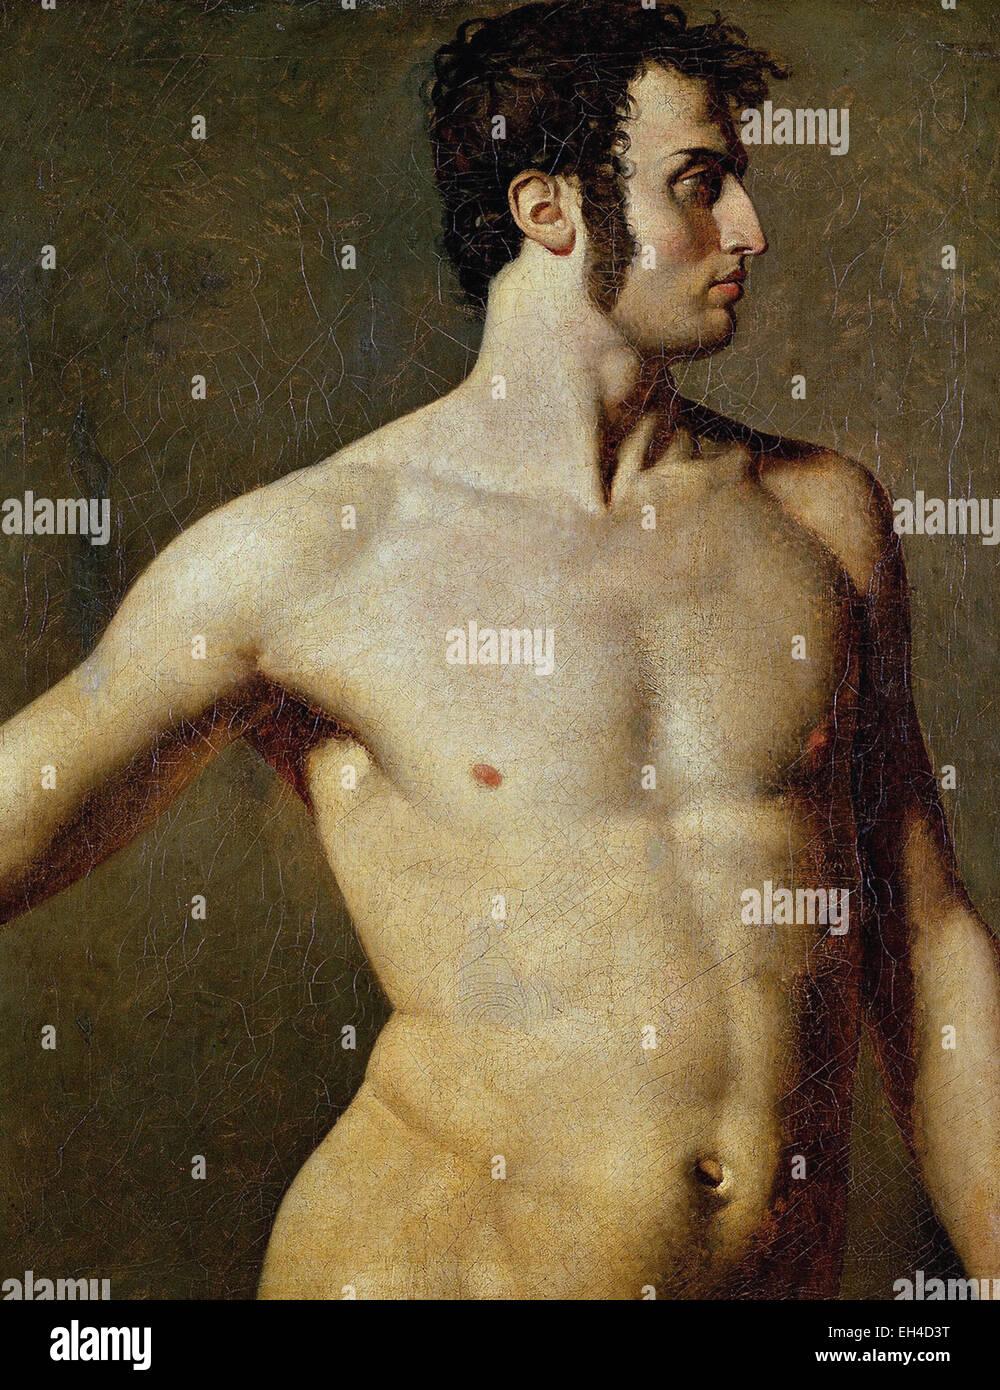 Jean-Auguste-Dominique Ingres  Male Torso - Stock Image